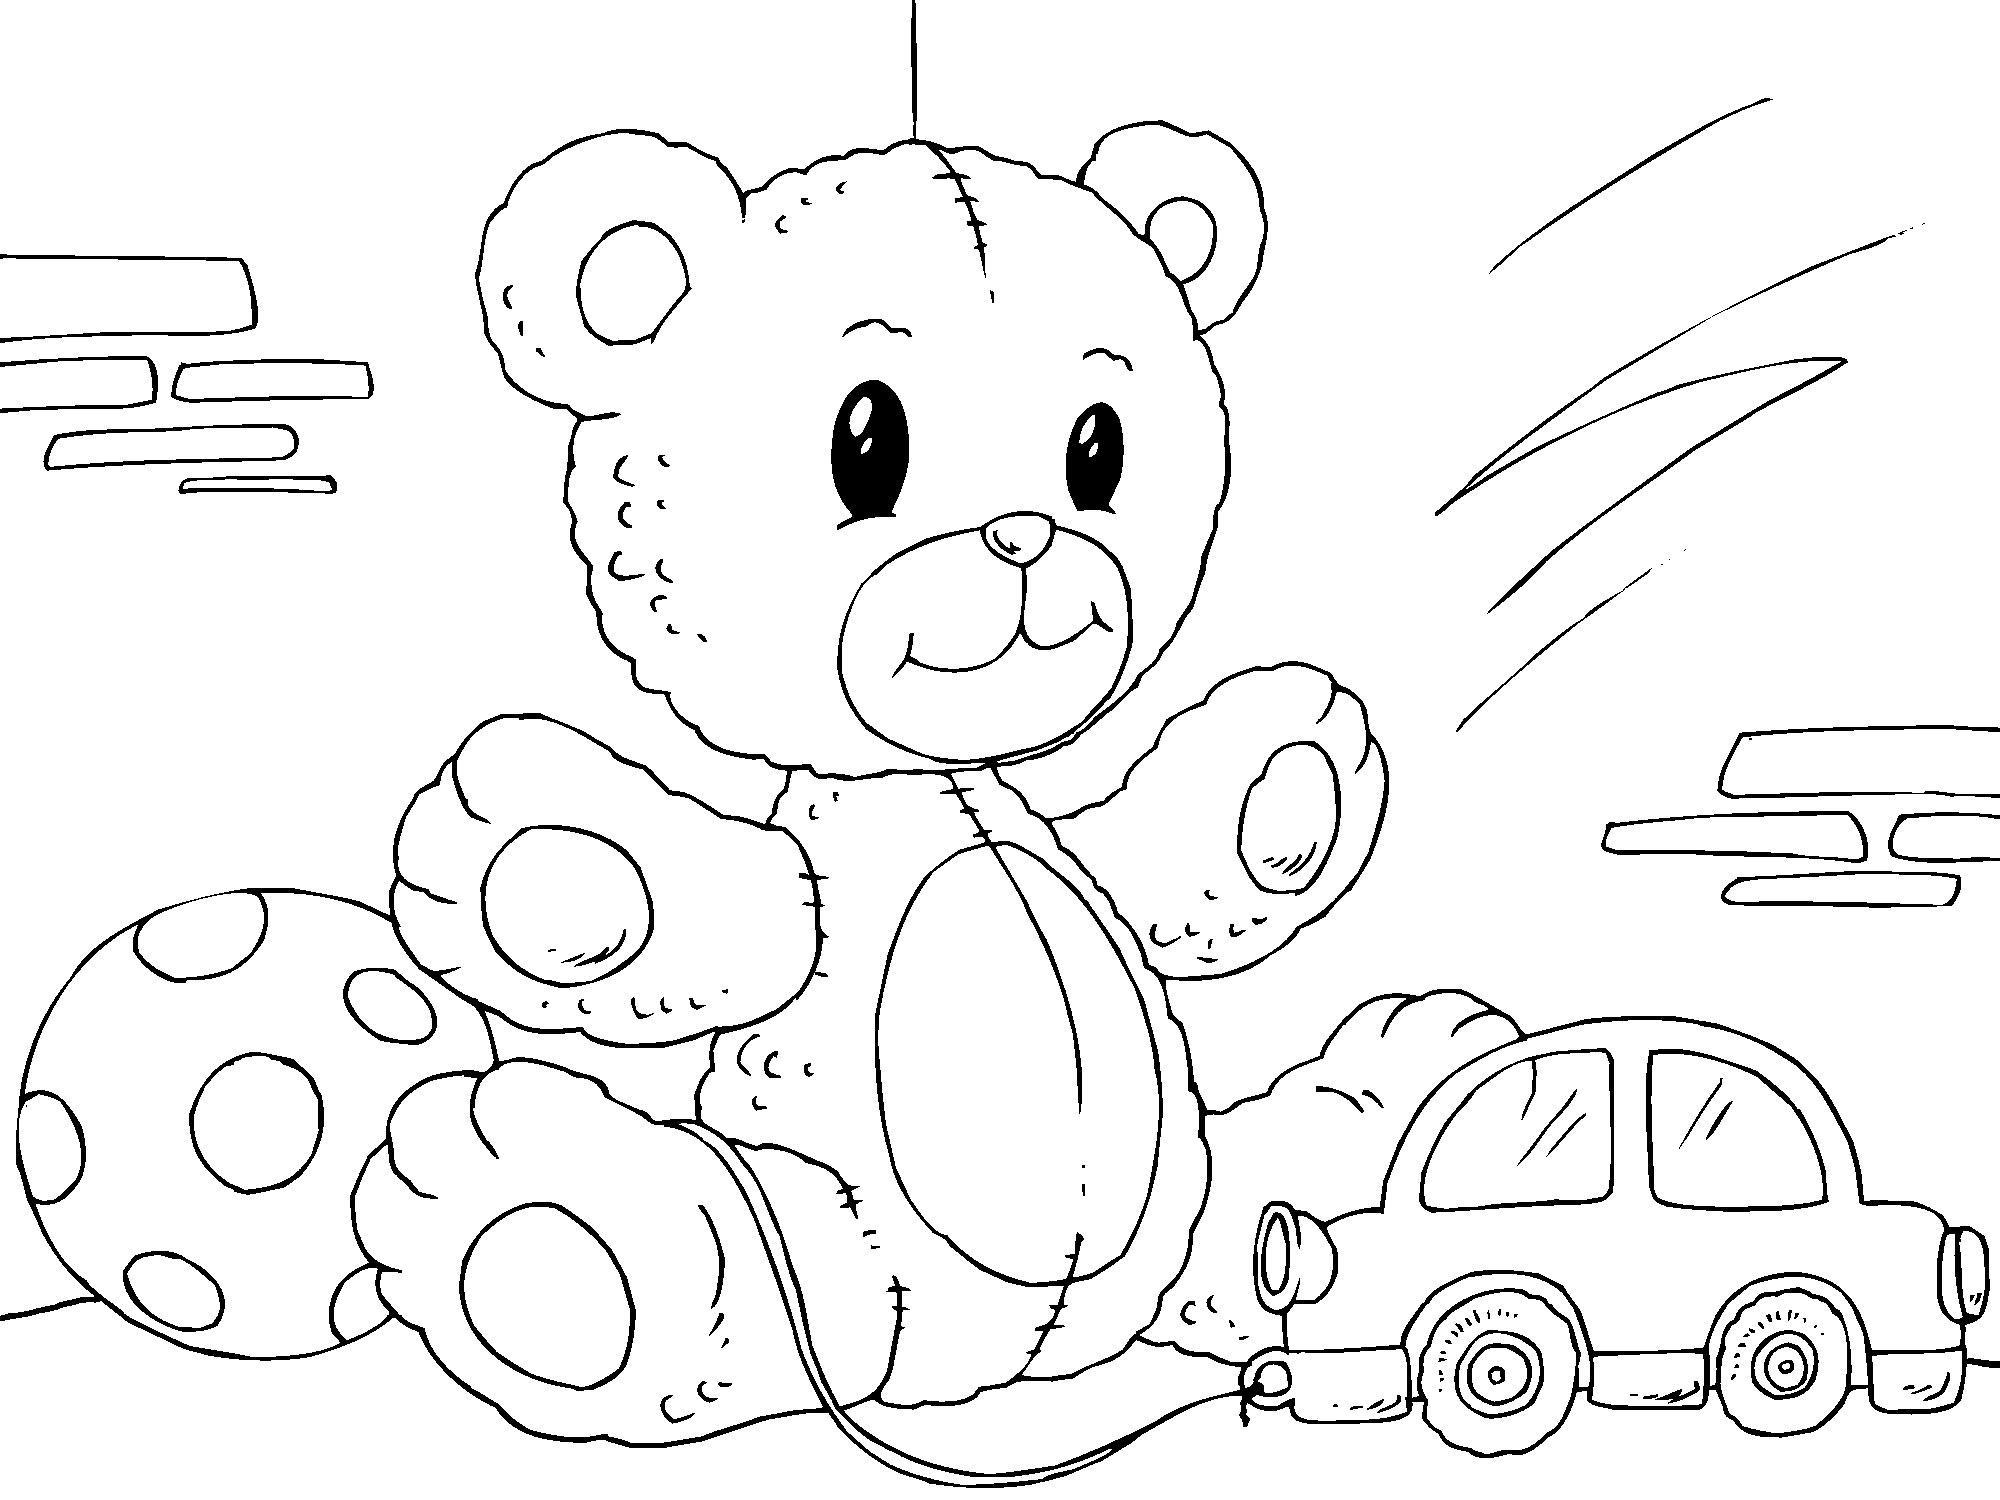 Dibujo para colorear osito de peluche img 22822 - Dibujos de peluches ...